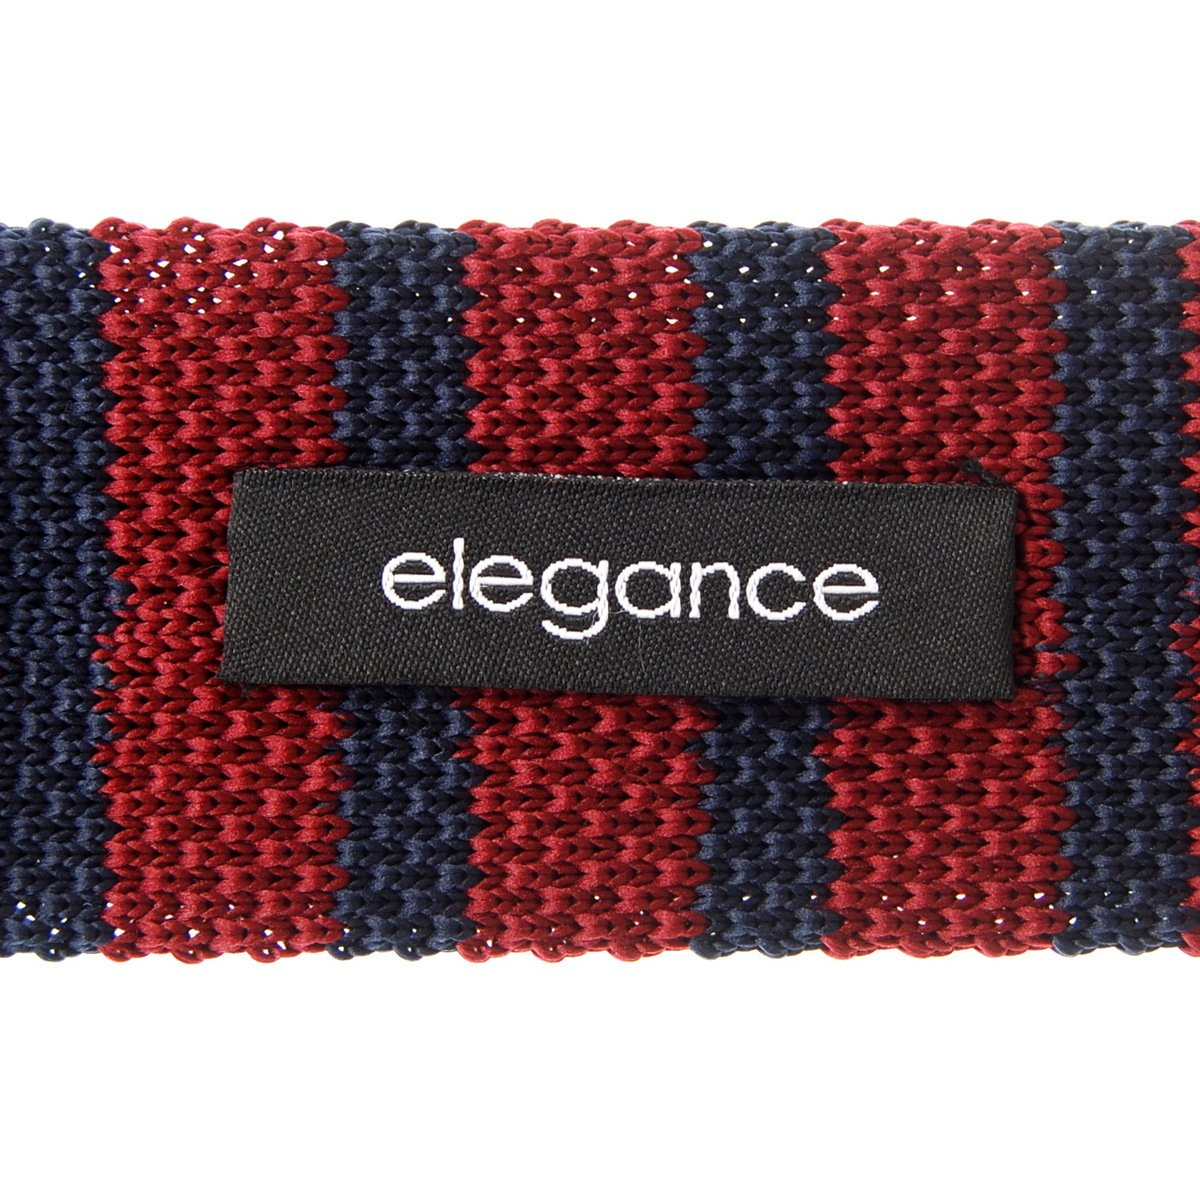 Retreez Vintage Smart Casual Mens 2 Skinny Knit Tie Necktie Various Colors